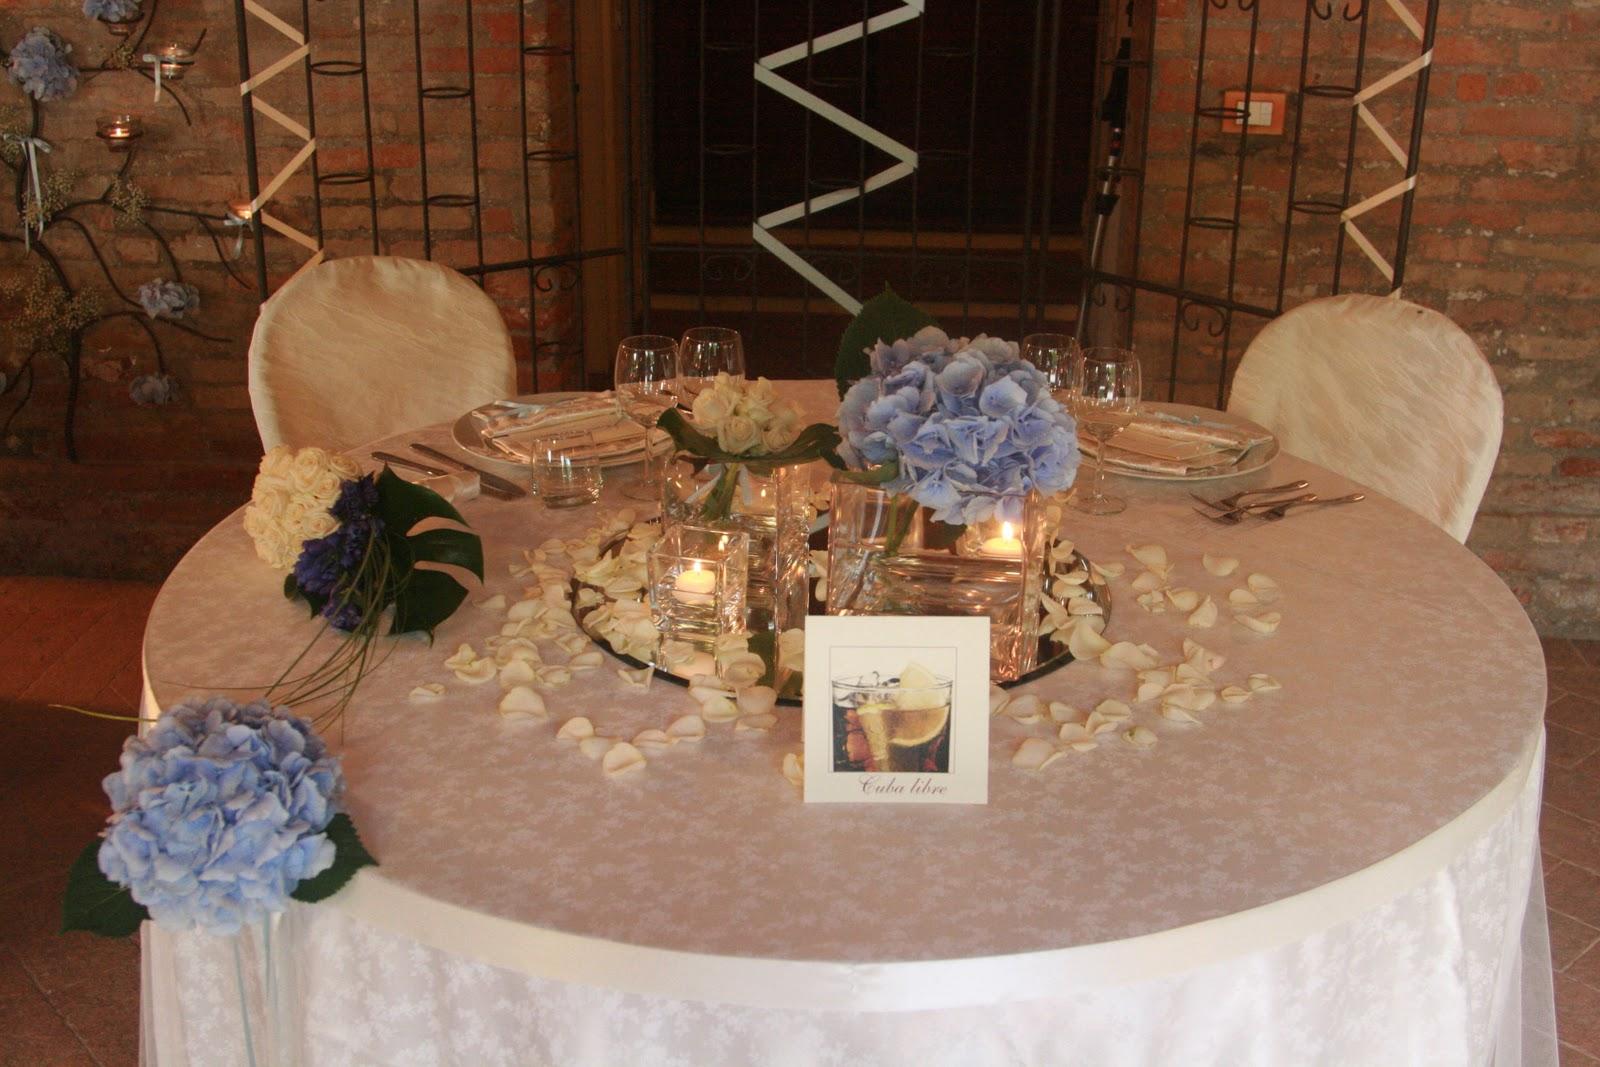 Mareventi wedding planner ravenna allestimenti floreali - Tavolo matrimonio casa sposa ...